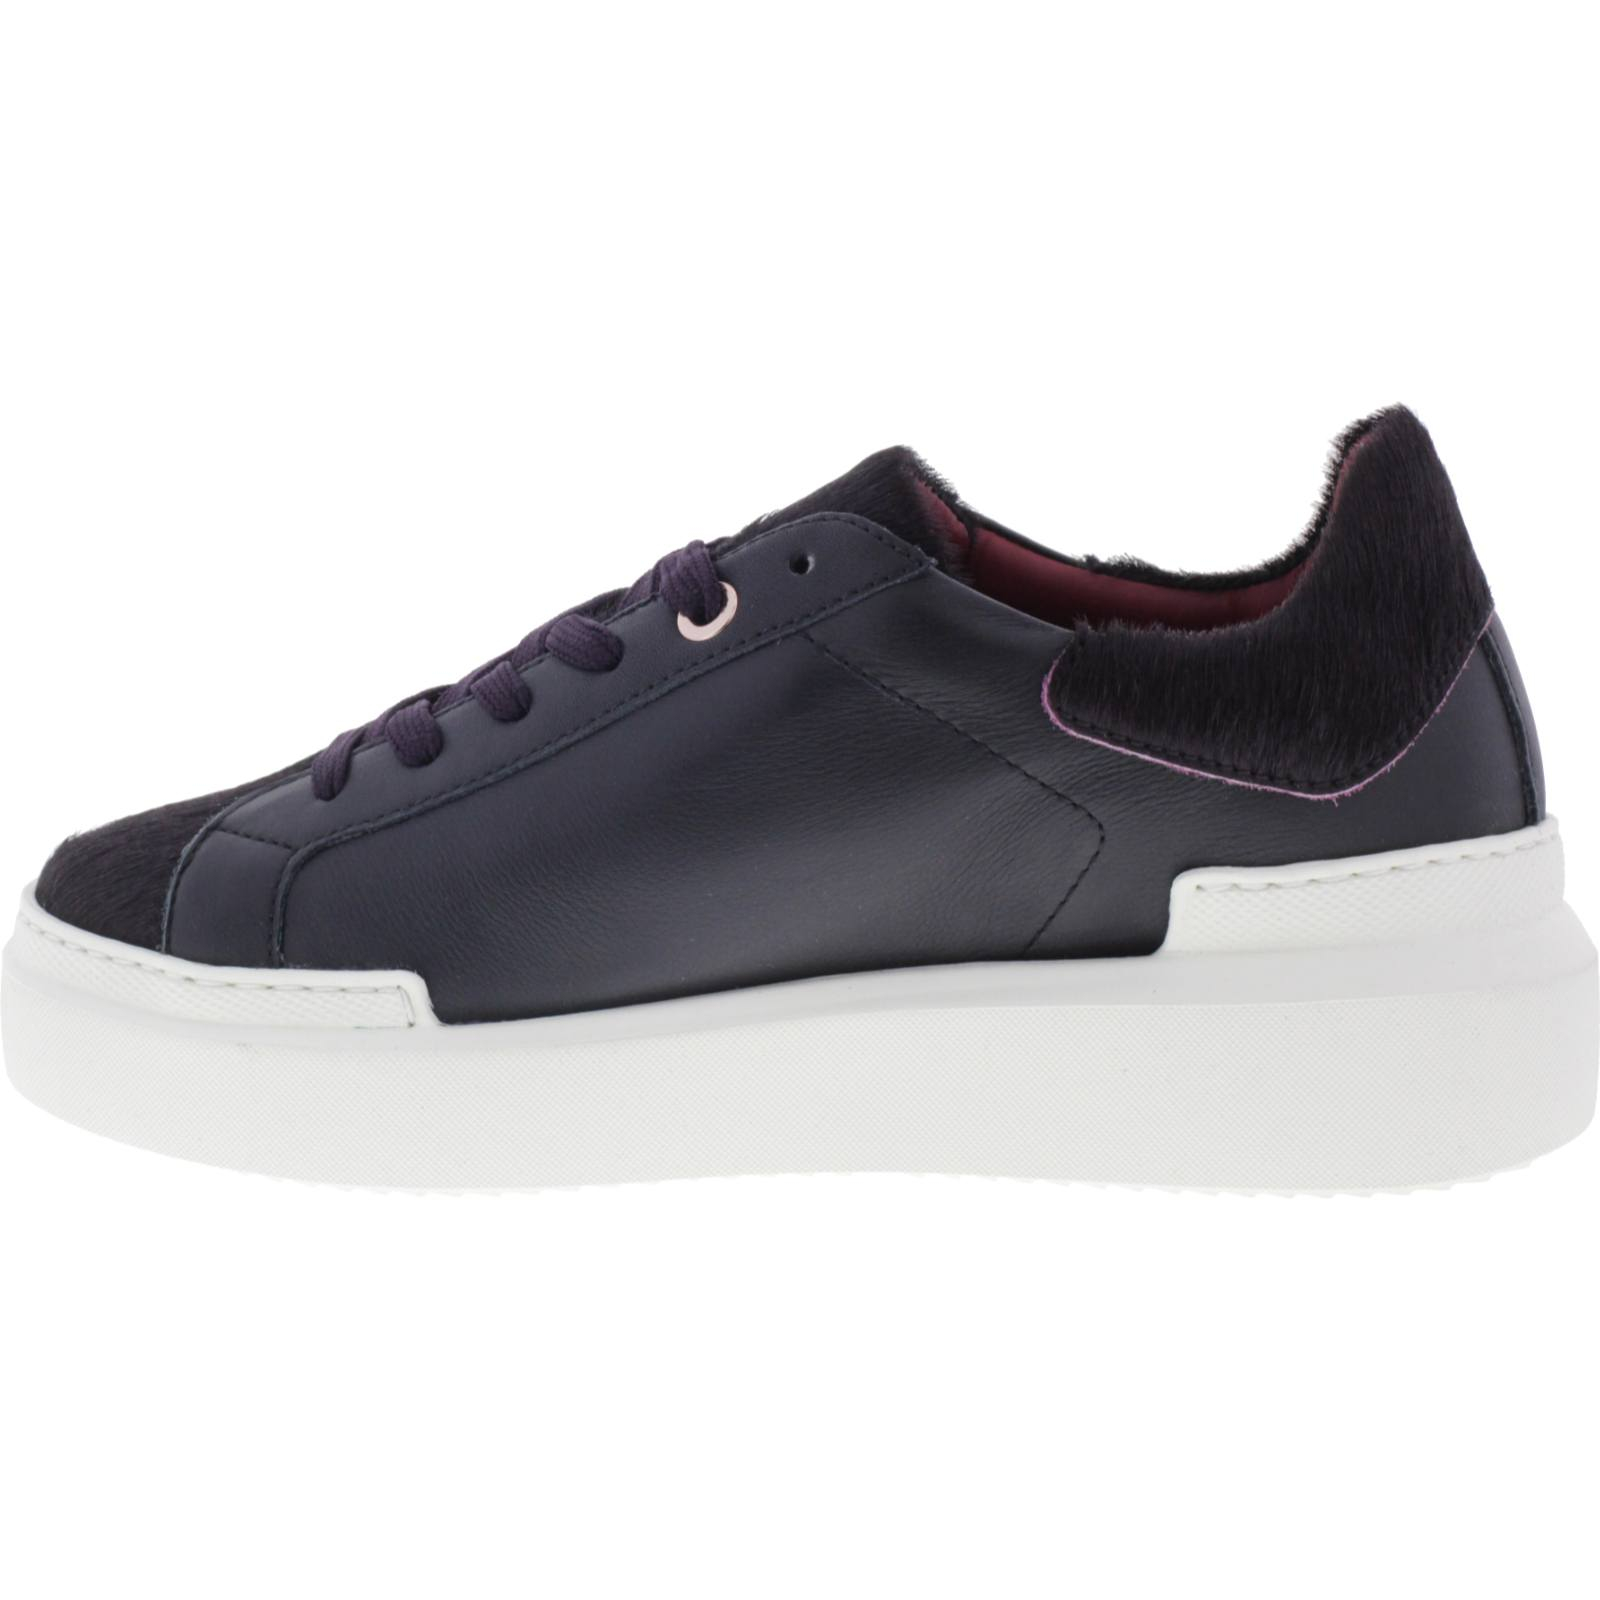 Sarah/Bordeaux Samt/Wechselfußbett Ed Parrish Sneakers/Modell Damen Sneakers